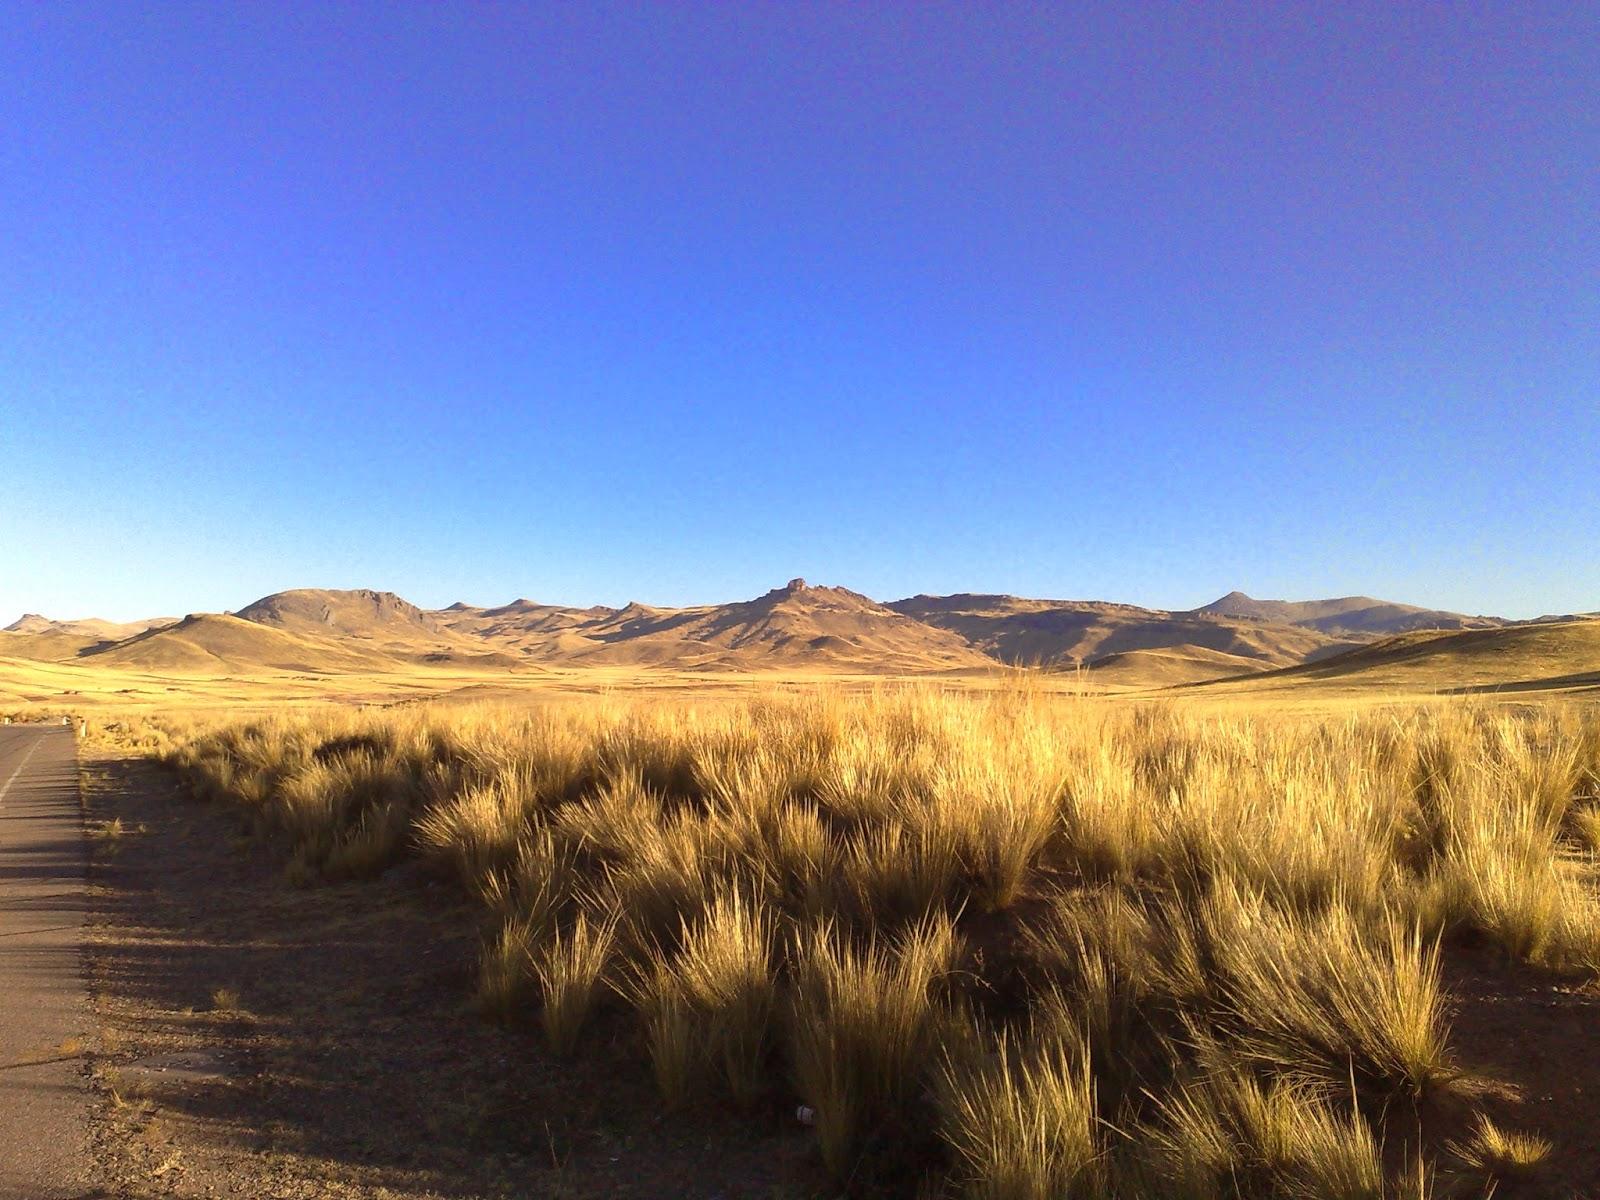 022 02092011763 - AVENTURA: SALAR DE UYUNI E LAGUNAS BOLIVIANAS VIA ACRE